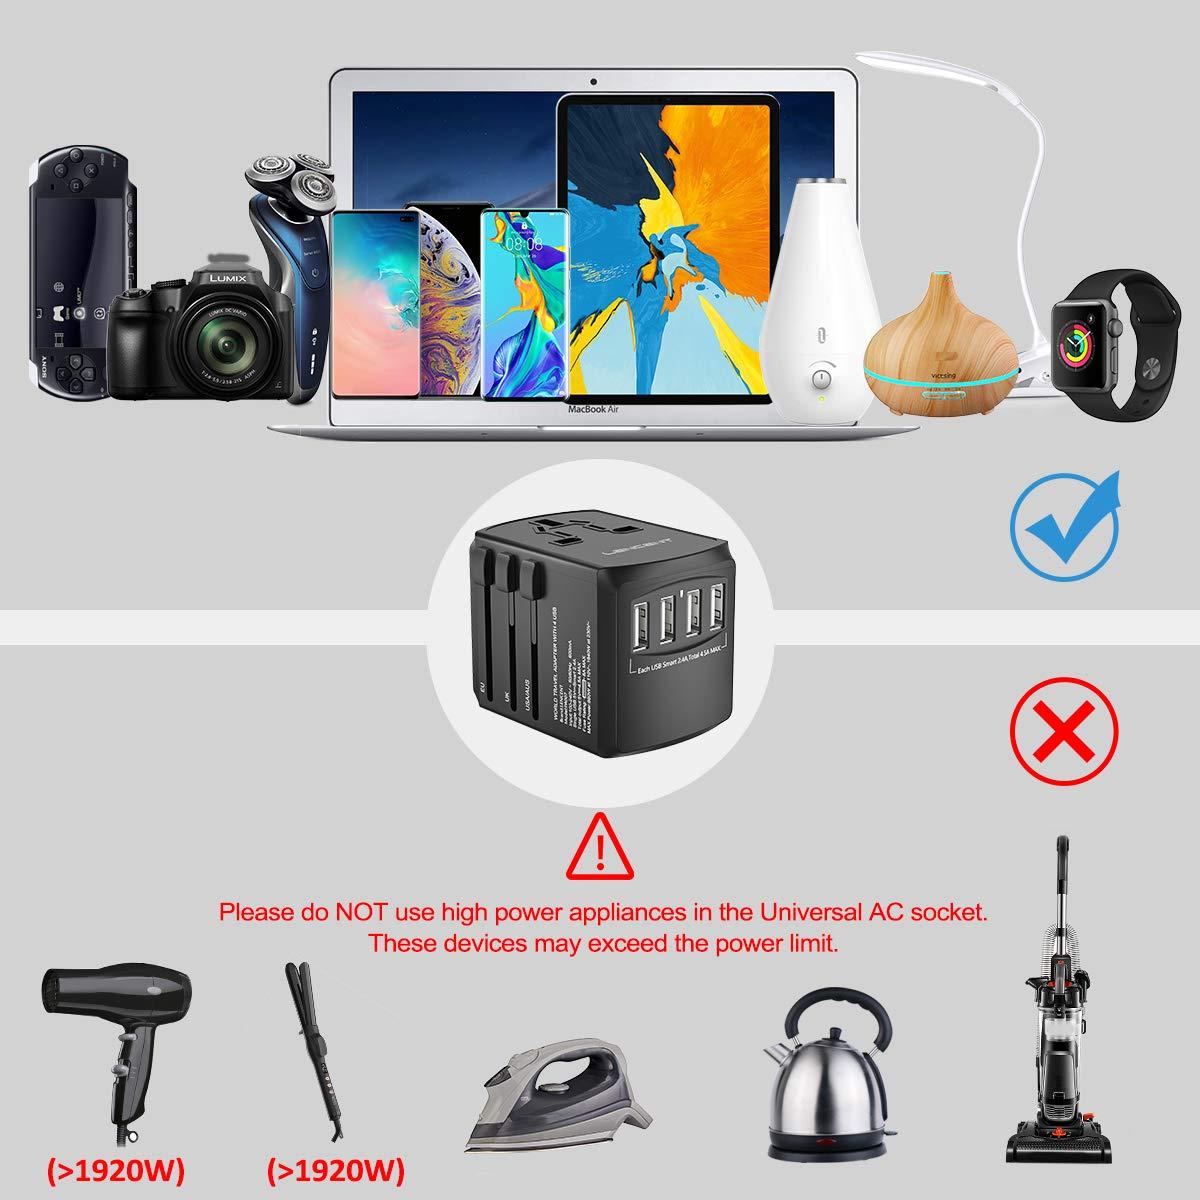 C/ámara y m/ás LENCENT Adaptador Enchufe De Viaje Universal Tabletas Cargador de Pared USB Internacional de 4 Puertos para EEUU//UK//EU//AUS M/ás de 200 Pa/íses para Tel/éfonos